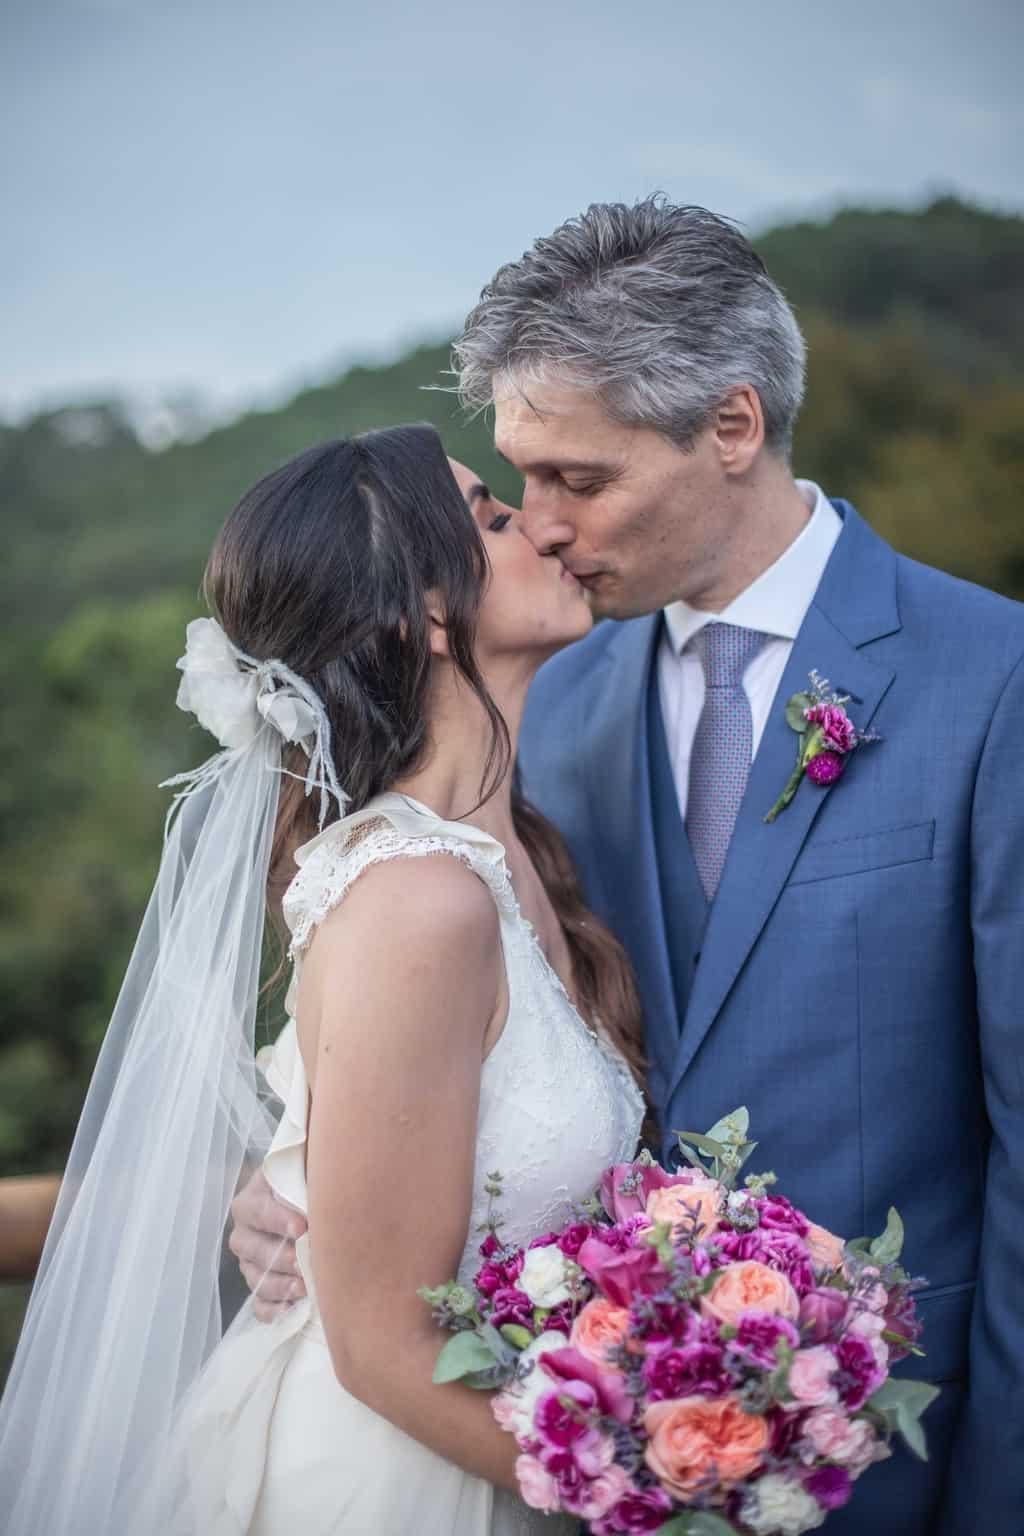 casamento-na-serra-foto-dos-noivos-Fotografia-Laura-Campanella-fotos-a-tarde-graviola-filmes-Juliana-e-Sebastian-noivos-no-altar-Pousada-La-Belle-Bruna87